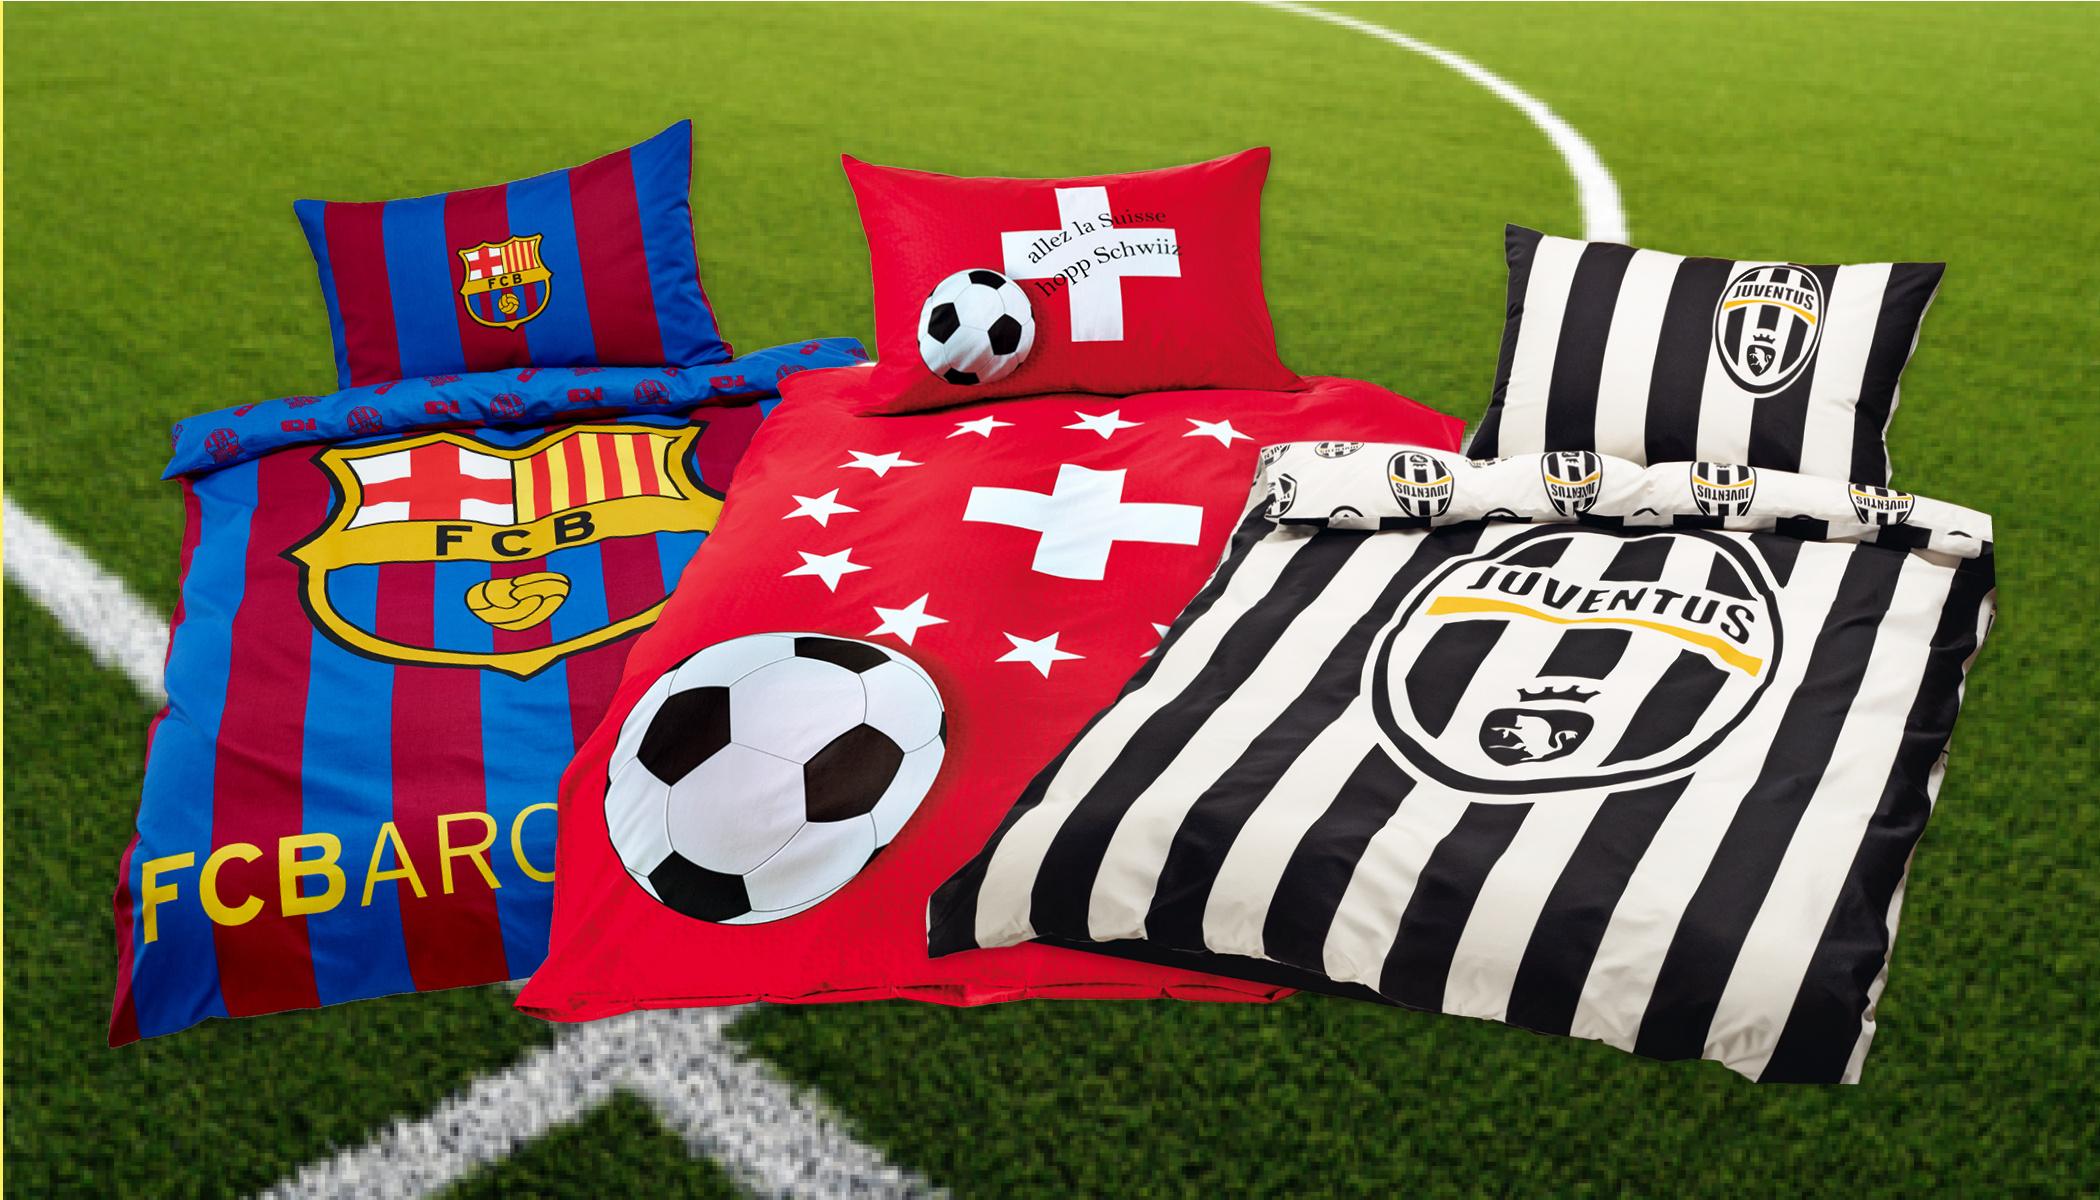 Design football